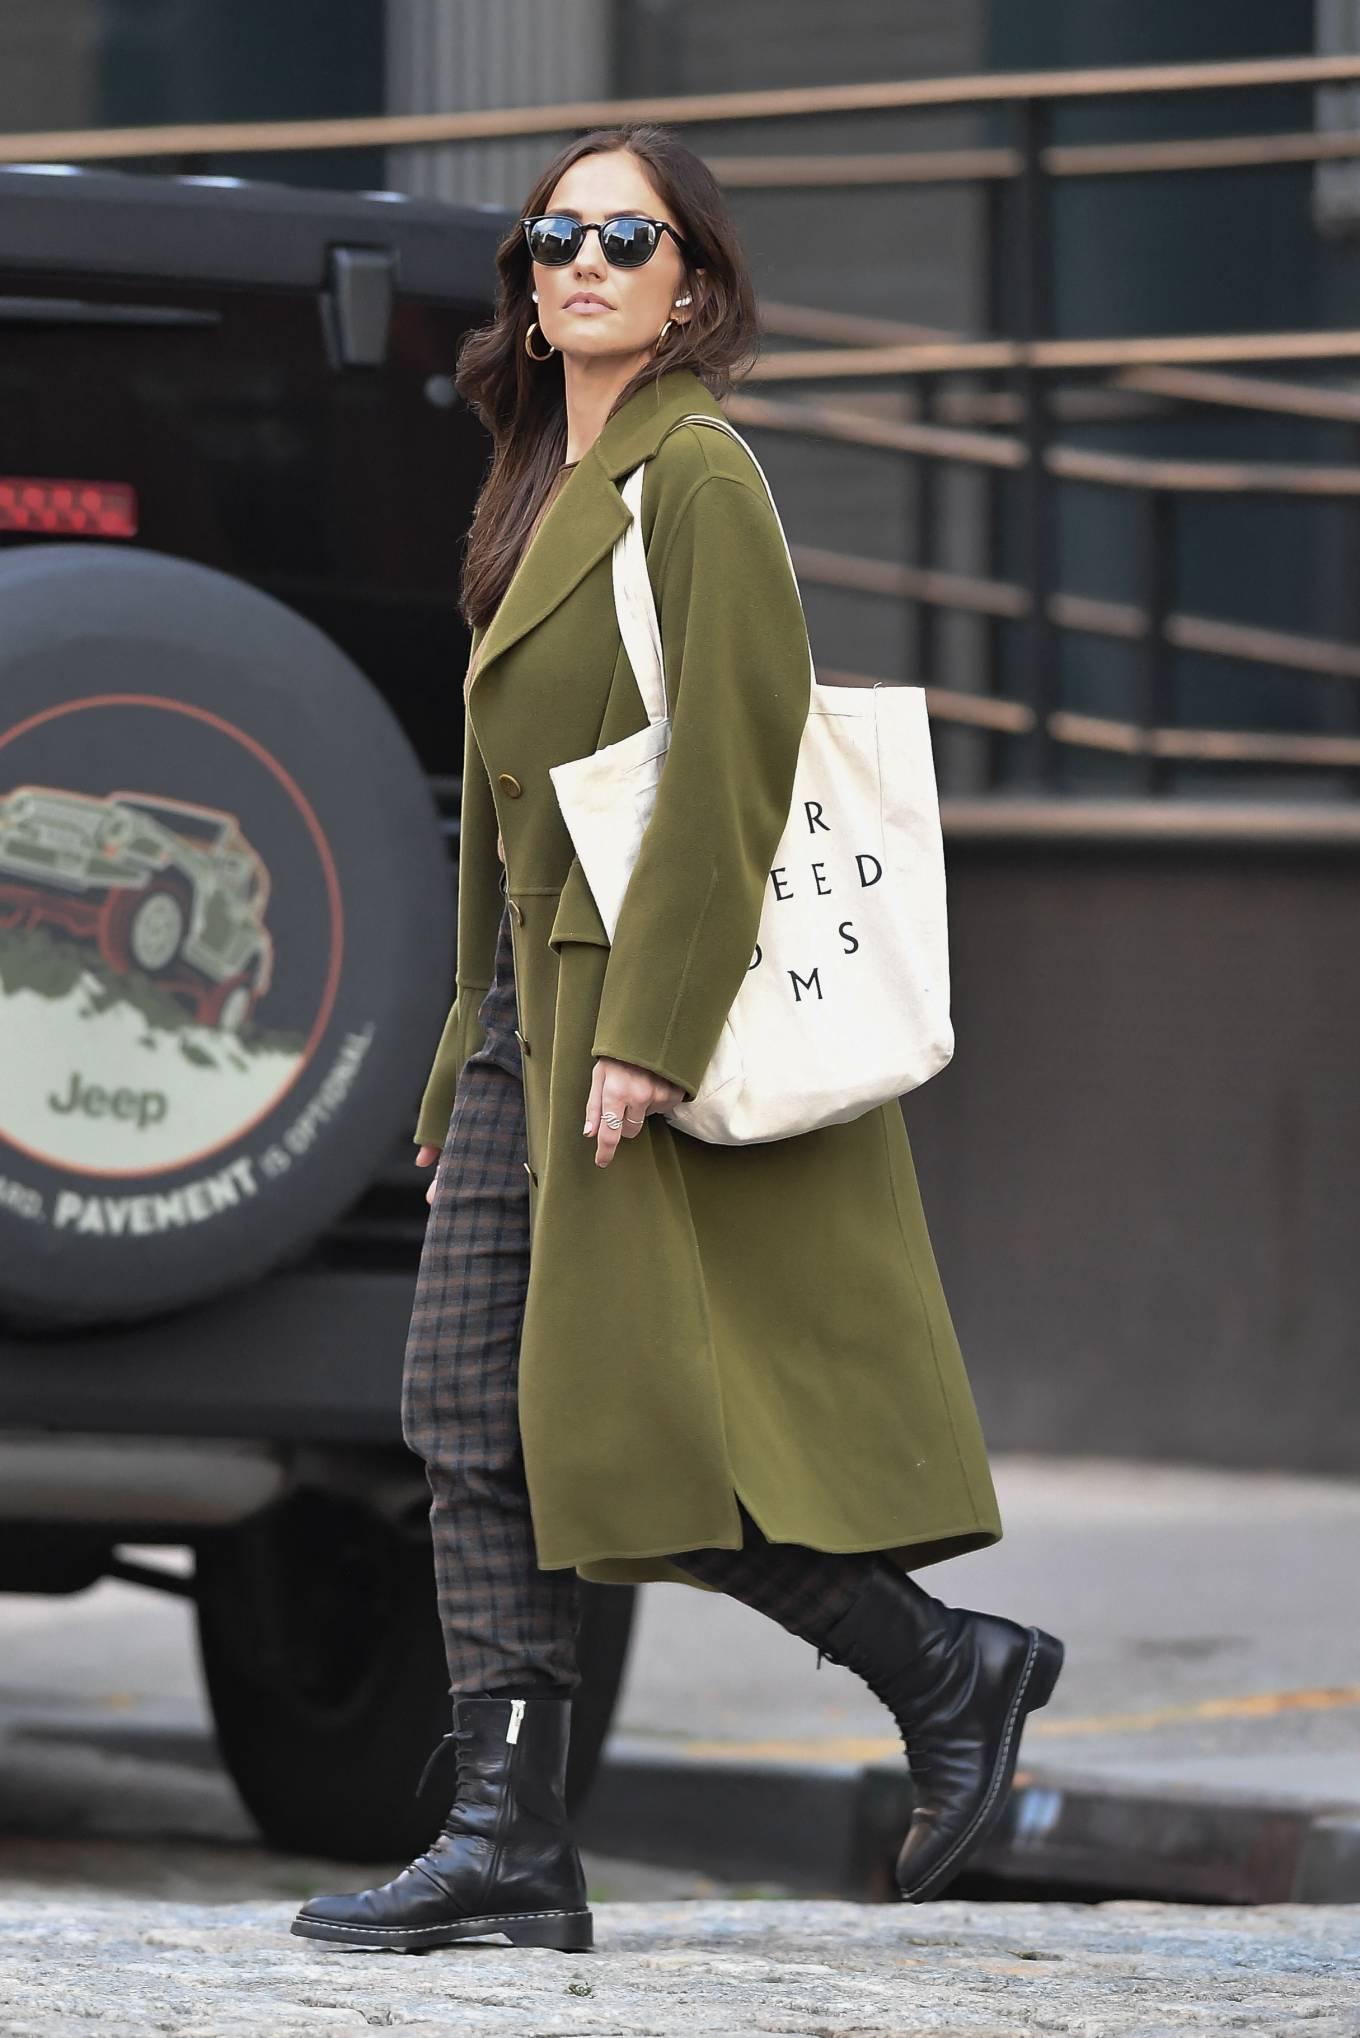 Minka Kelly 2021 : Minka Kelly – In olive green runs errands in New York-23